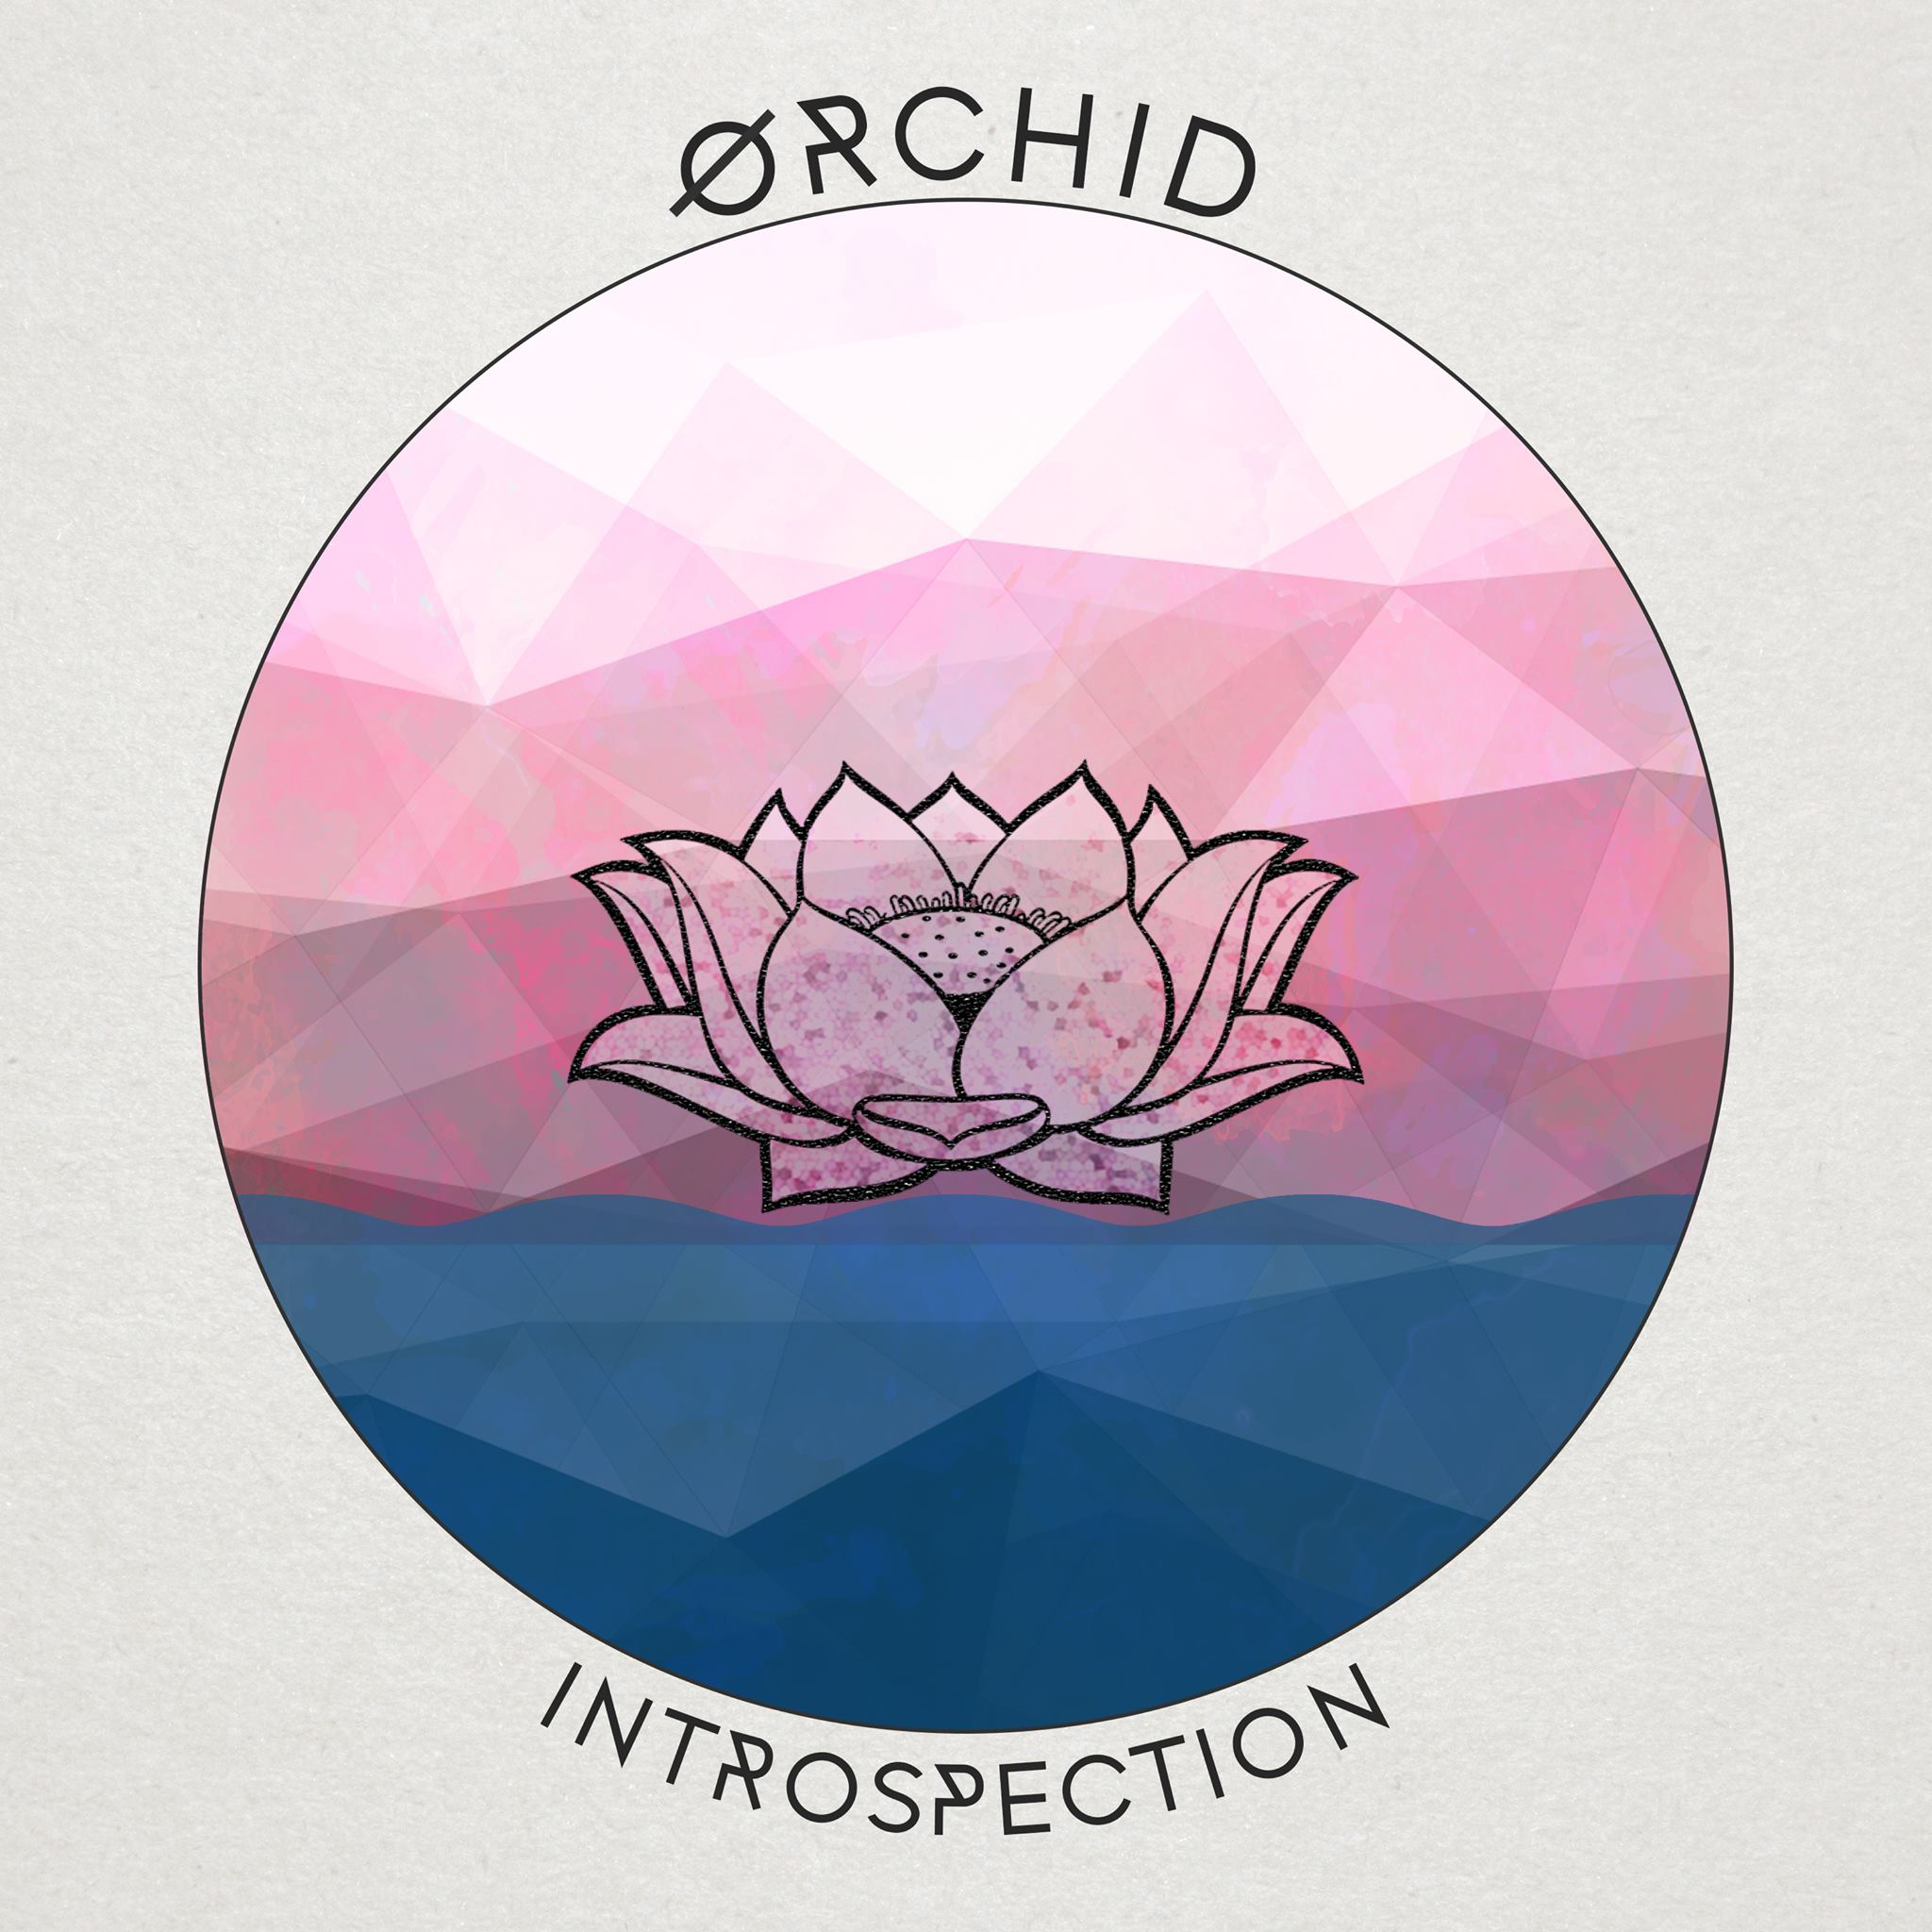 Introspection (ØRCHID)